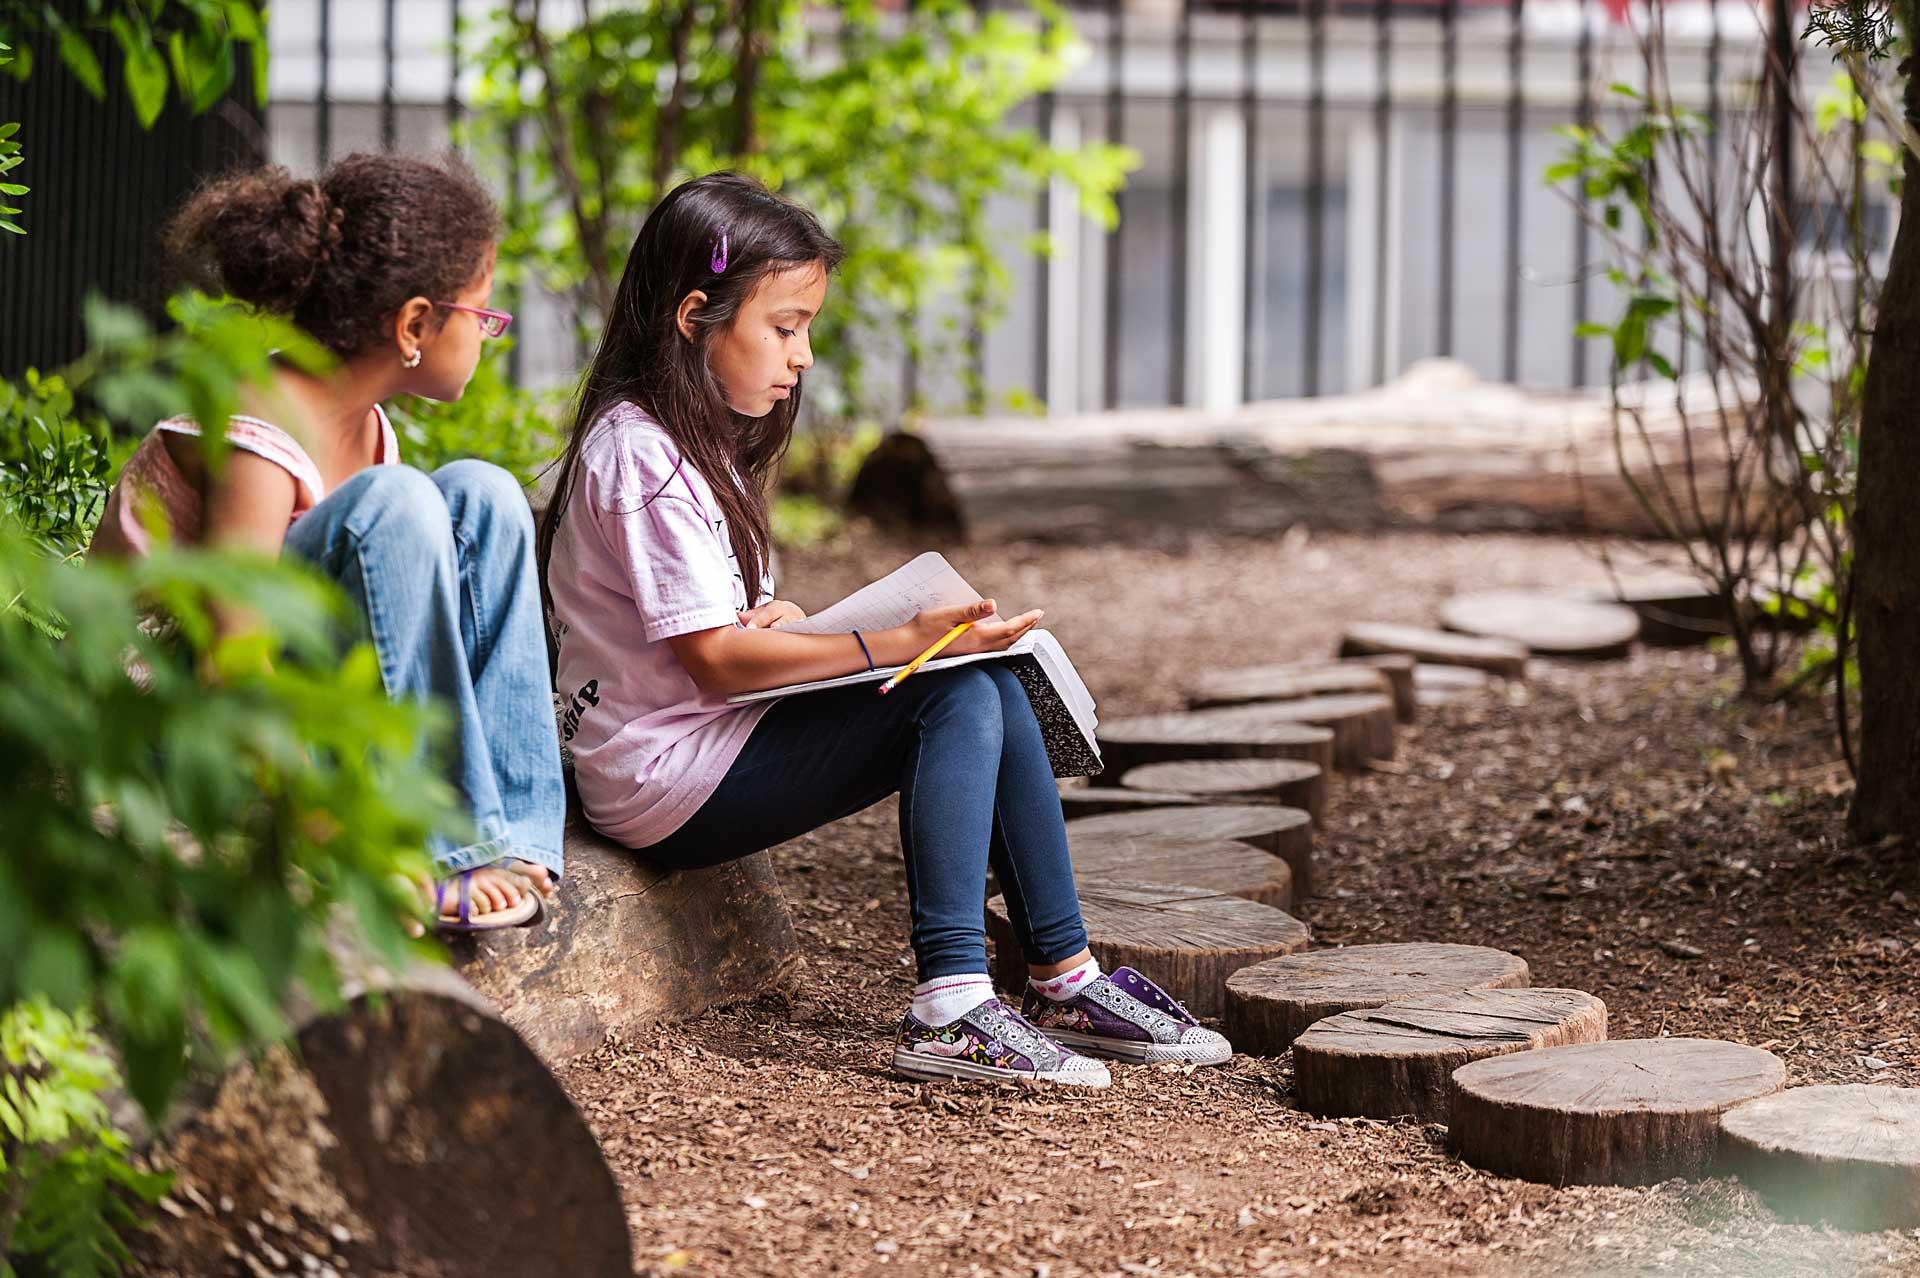 3_Schoolyard-Initiative_Klopfer-Martin-Design-Group_outdoor-classroom_landscape-architecture.jpg